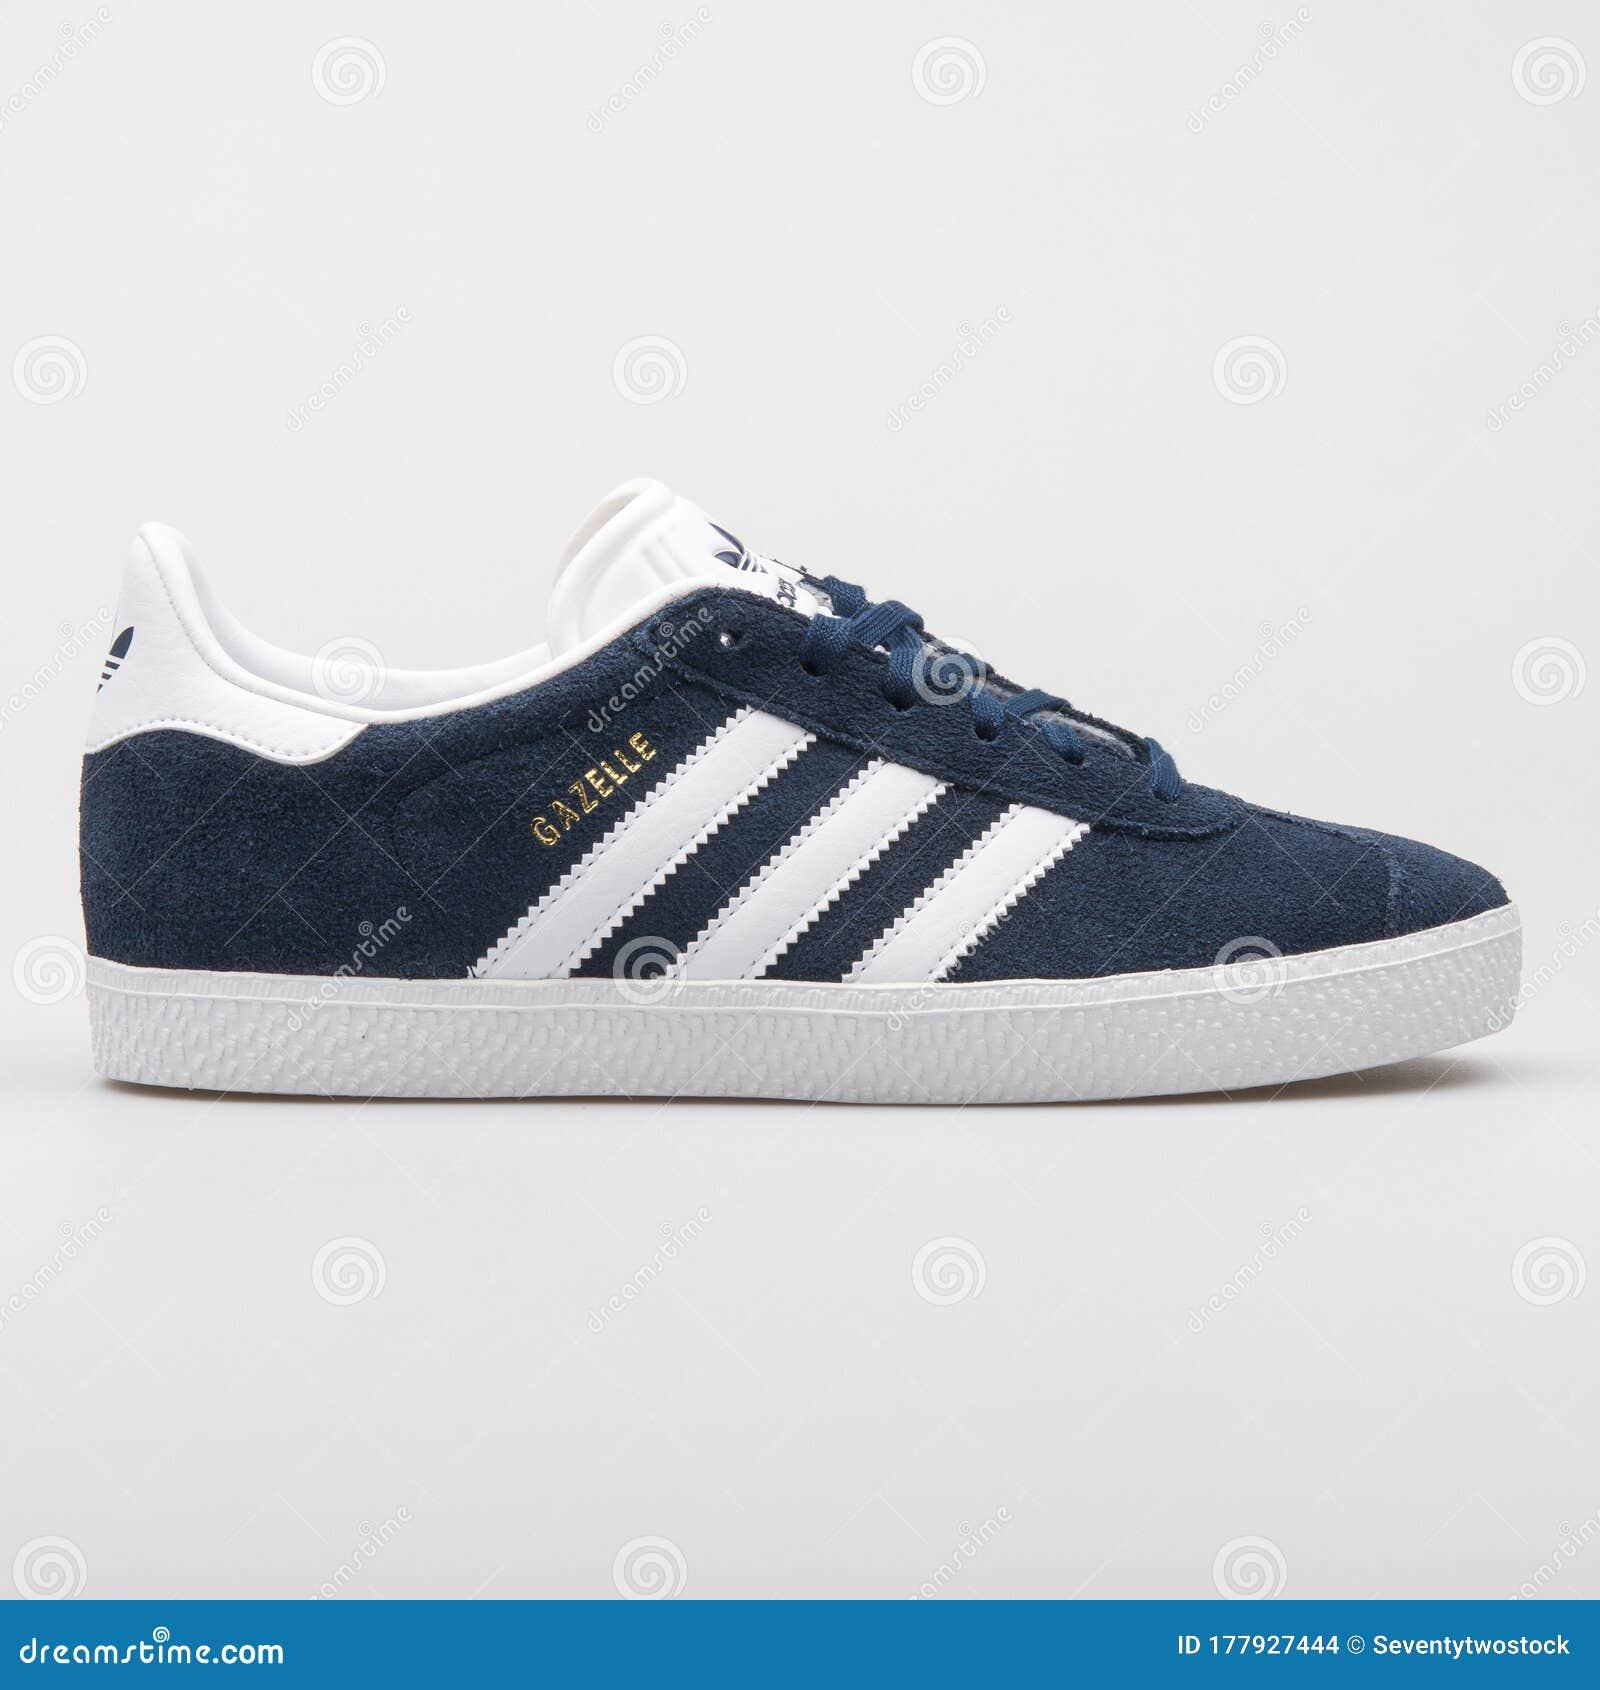 Adidas Gazelle Junior Navy Blue And